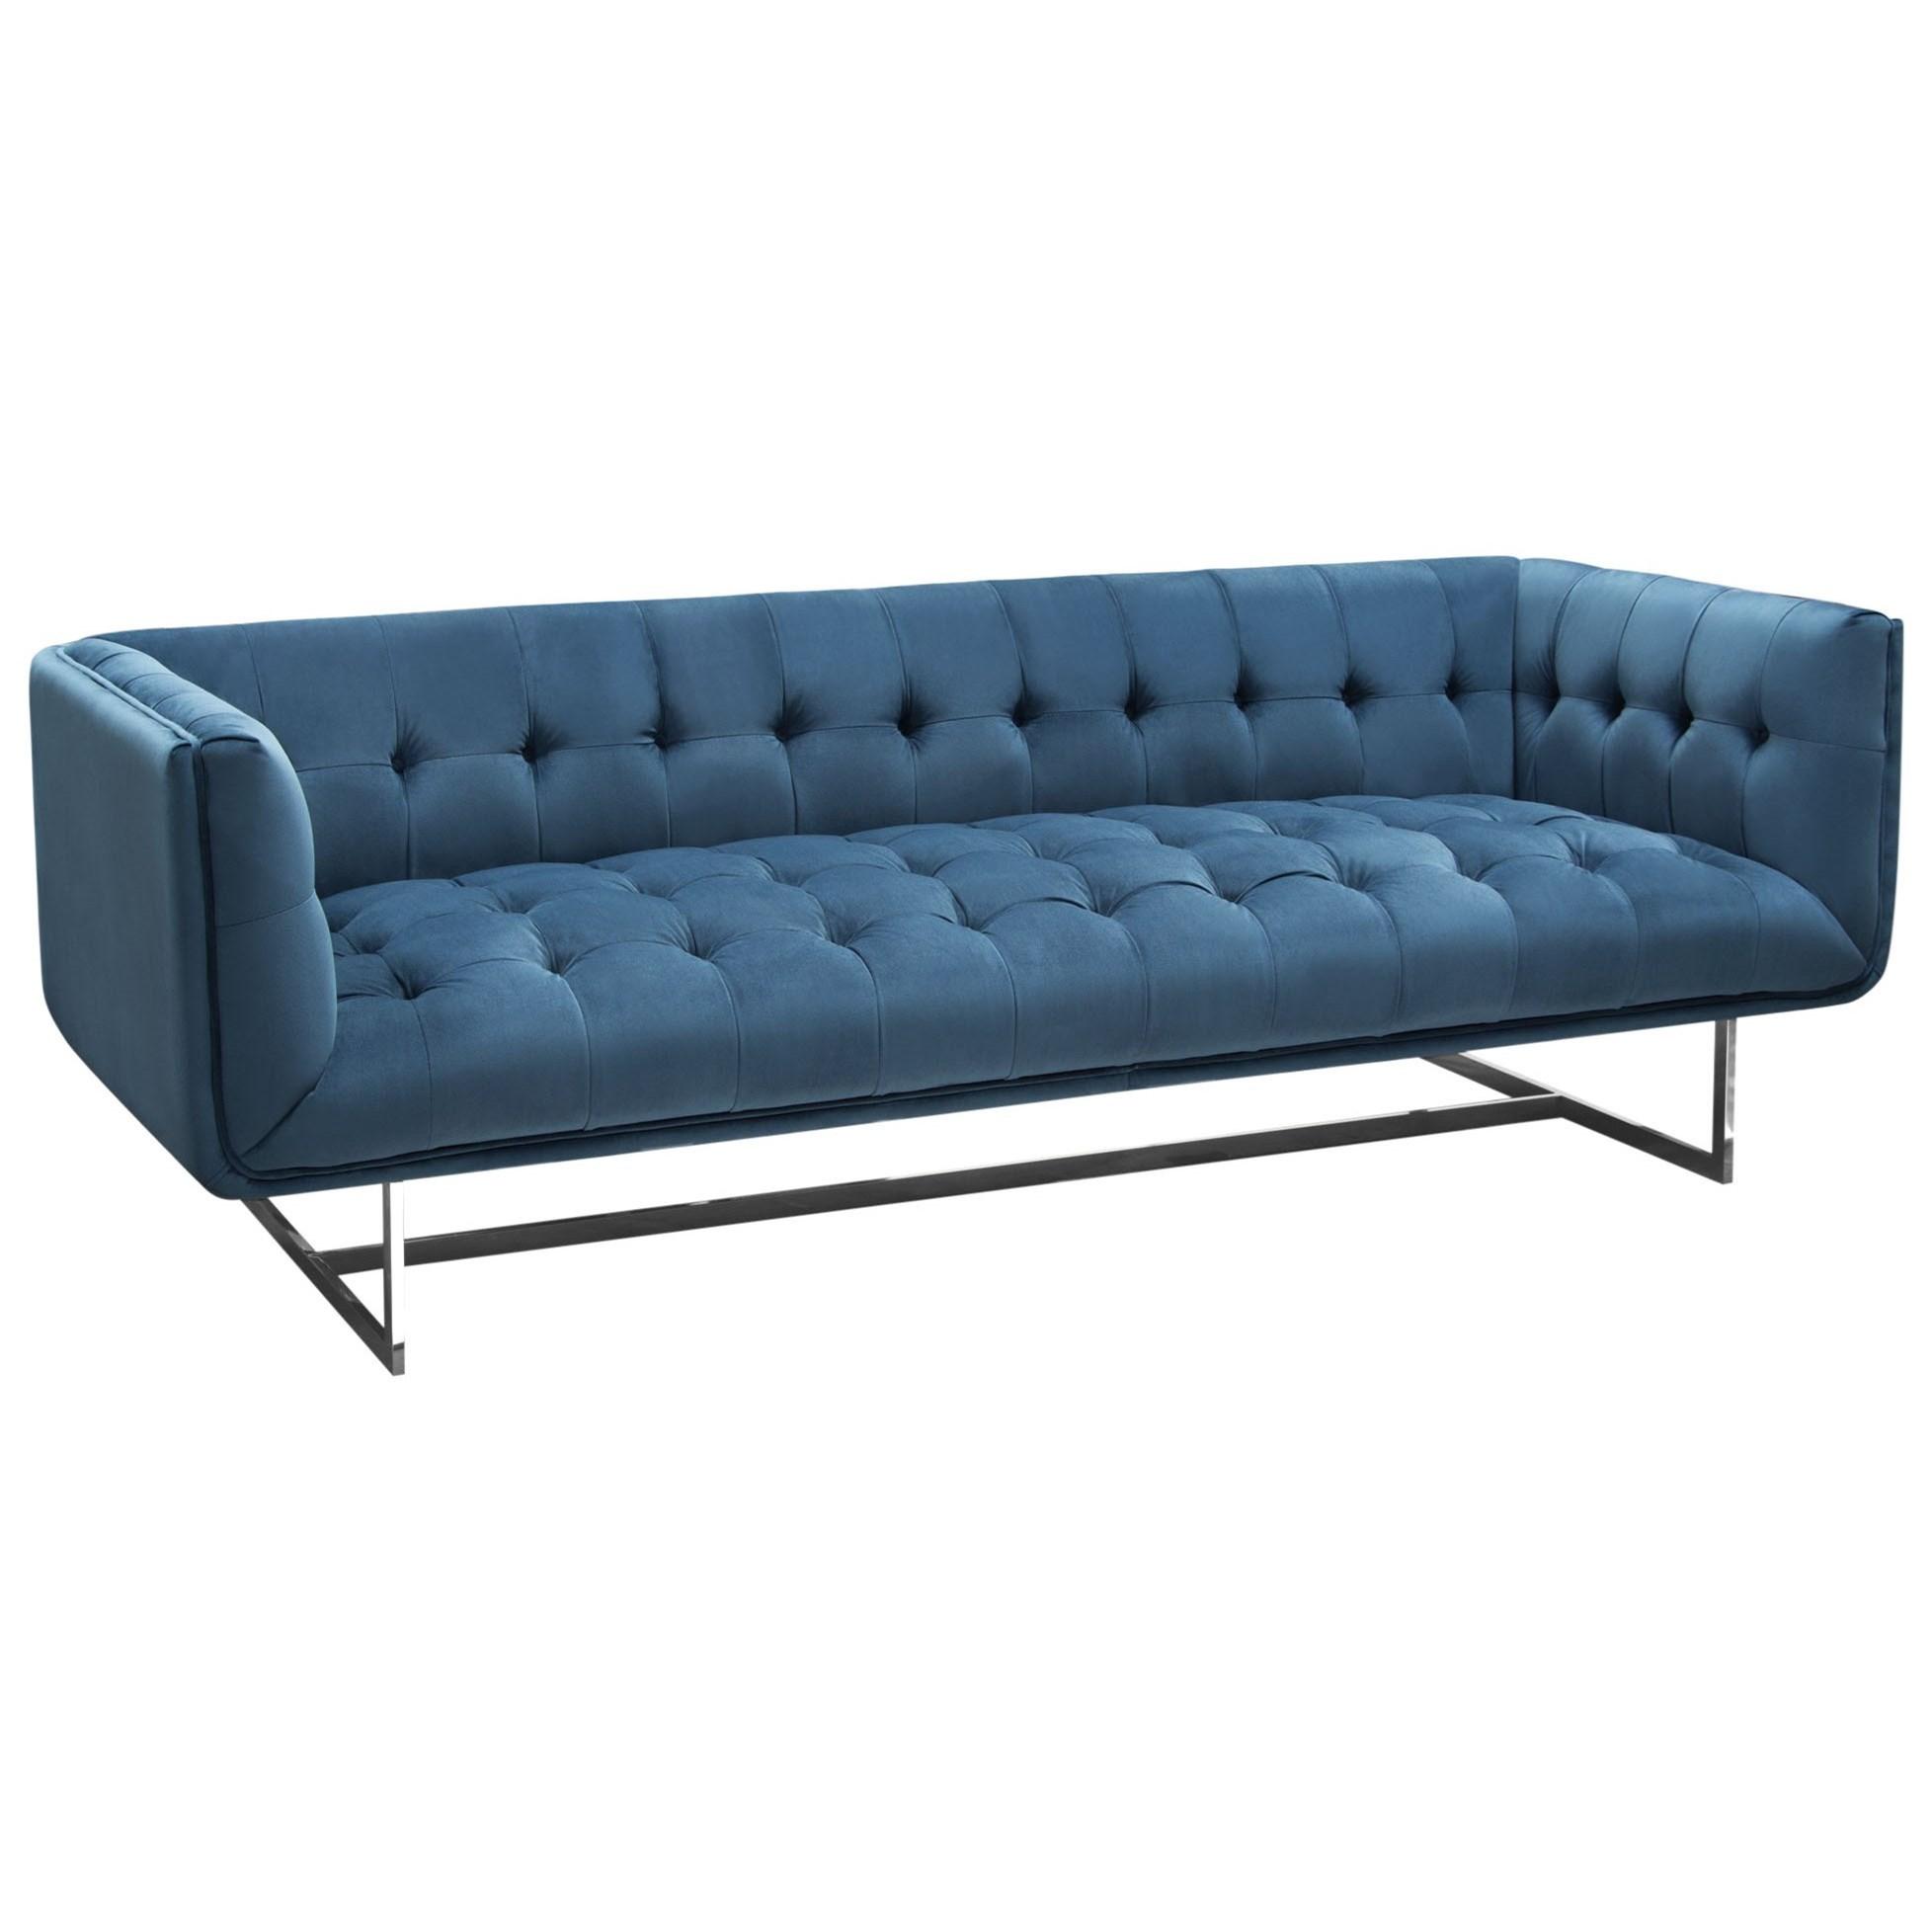 Hollywood Sofa by Diamond Sofa at HomeWorld Furniture